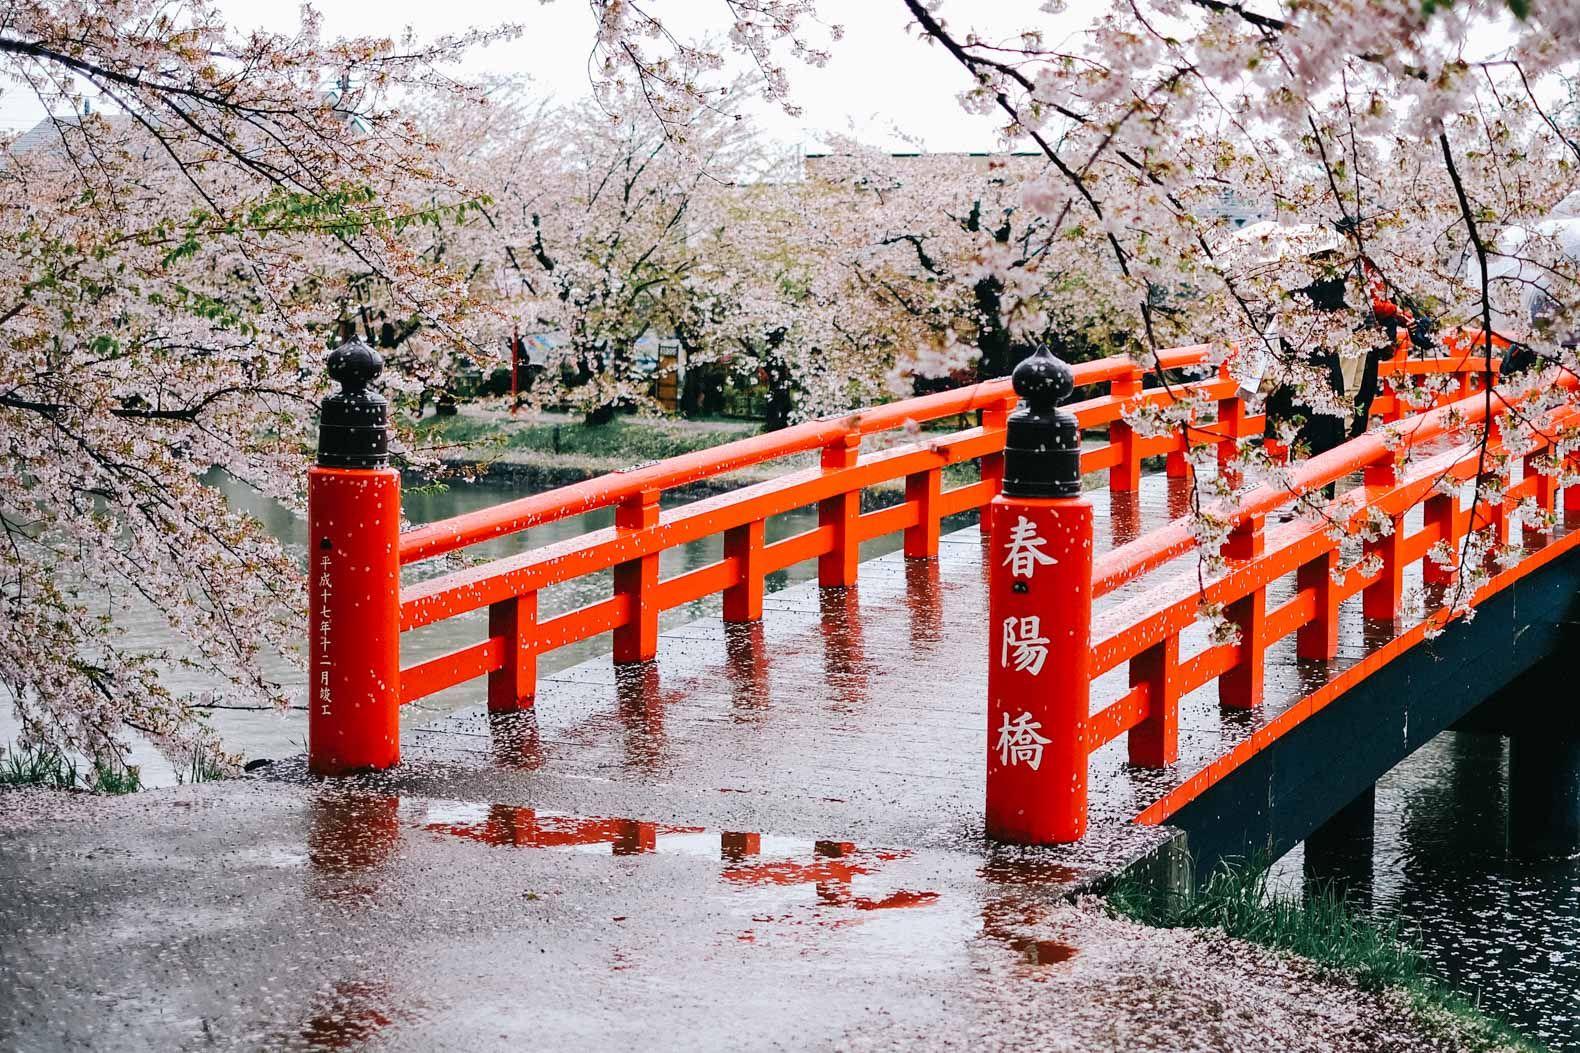 Northern Japan S 2 500 Tree Cherry Blossom Wonderland Cherry Blossom Japan Cherry Blossom Cherry Blossom Festival